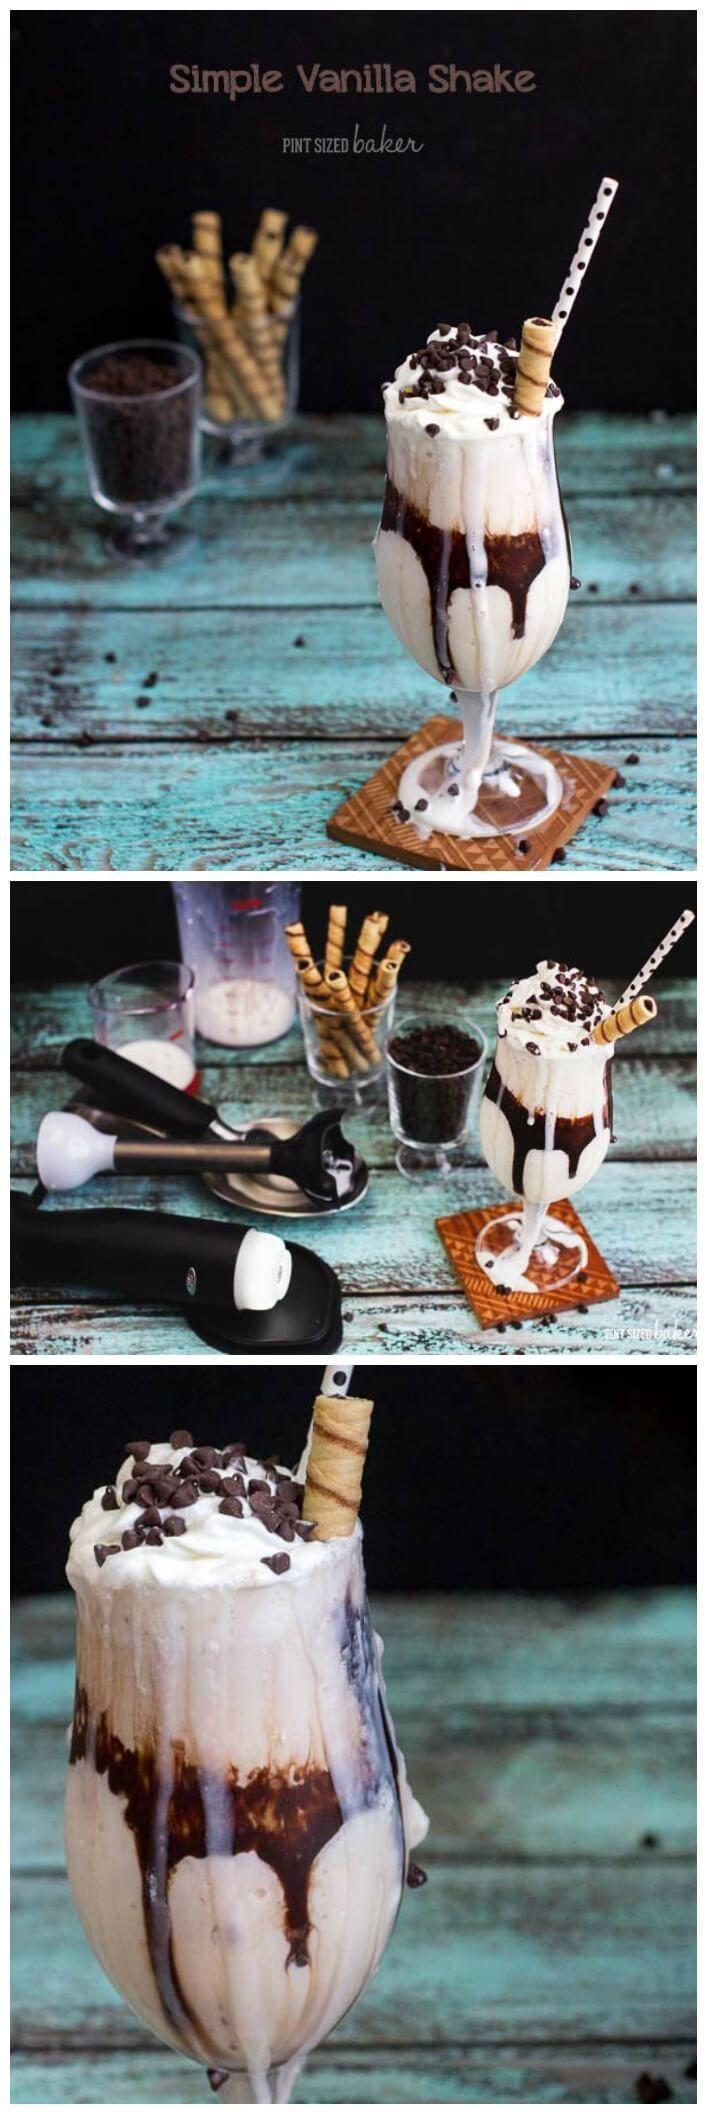 Simple Vanilla Milkshake Recipe made using the OXO On Illuminating Digital Immersion Blender